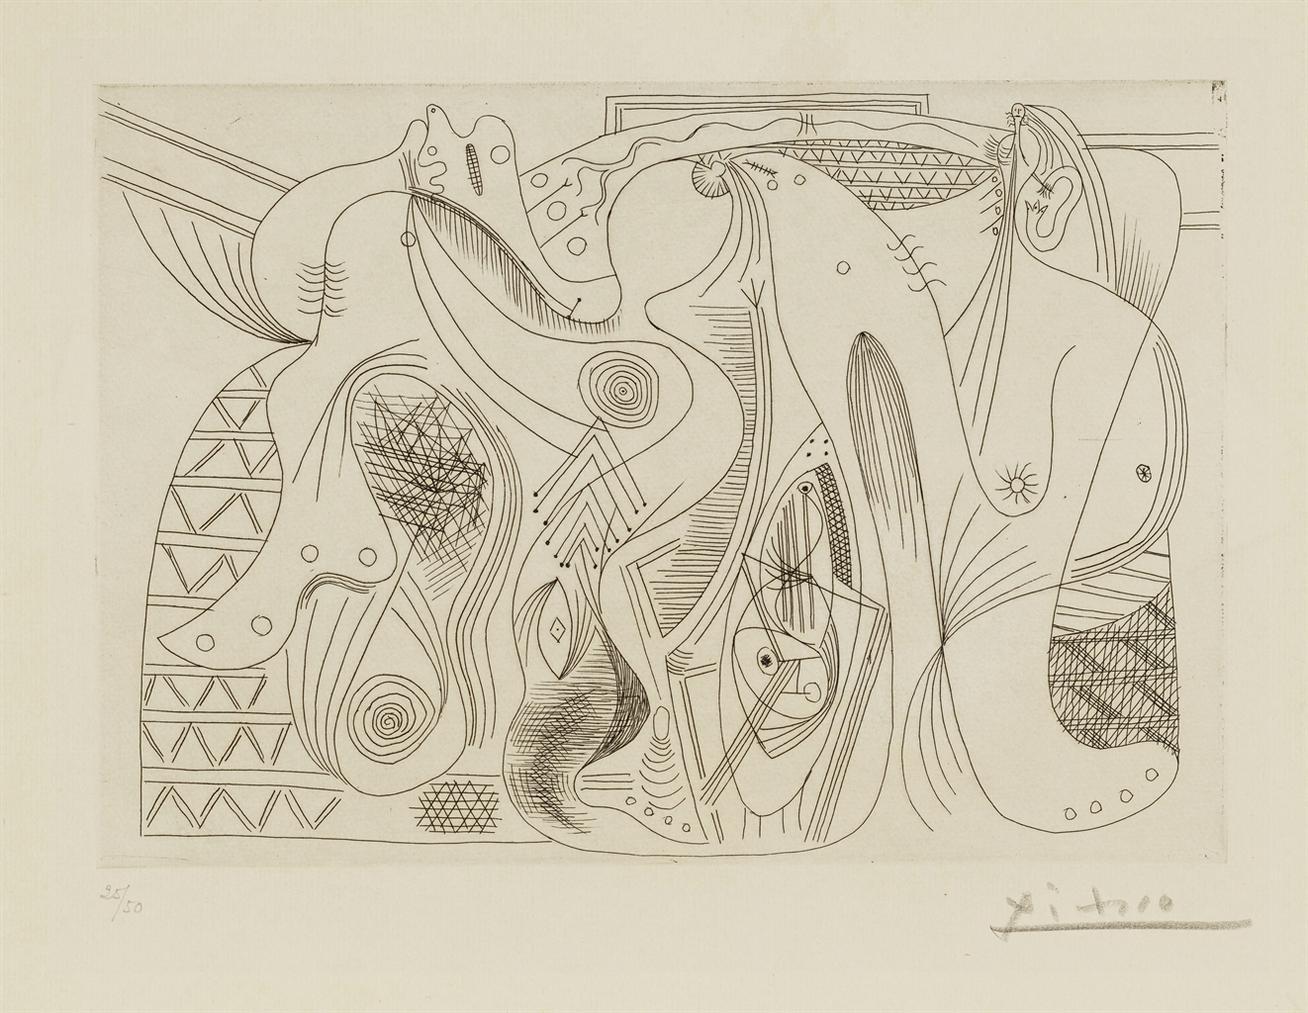 Pablo Picasso-Figures-1927